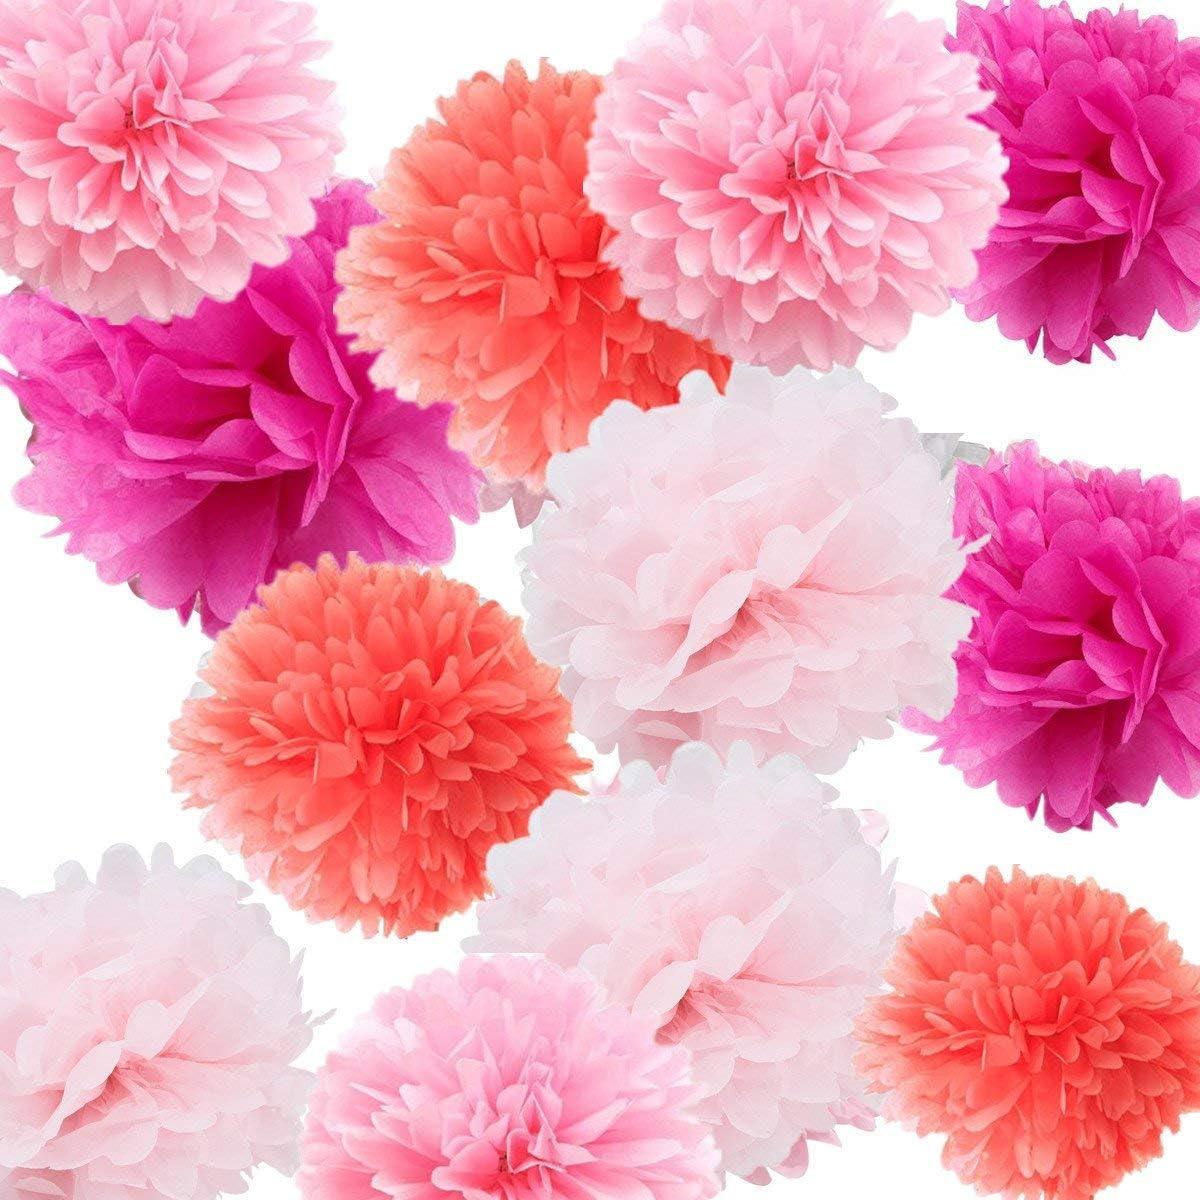 kilofly 24pc Wedding Crafts Tissue Paper Pom Pom Flower Color Party Decoration